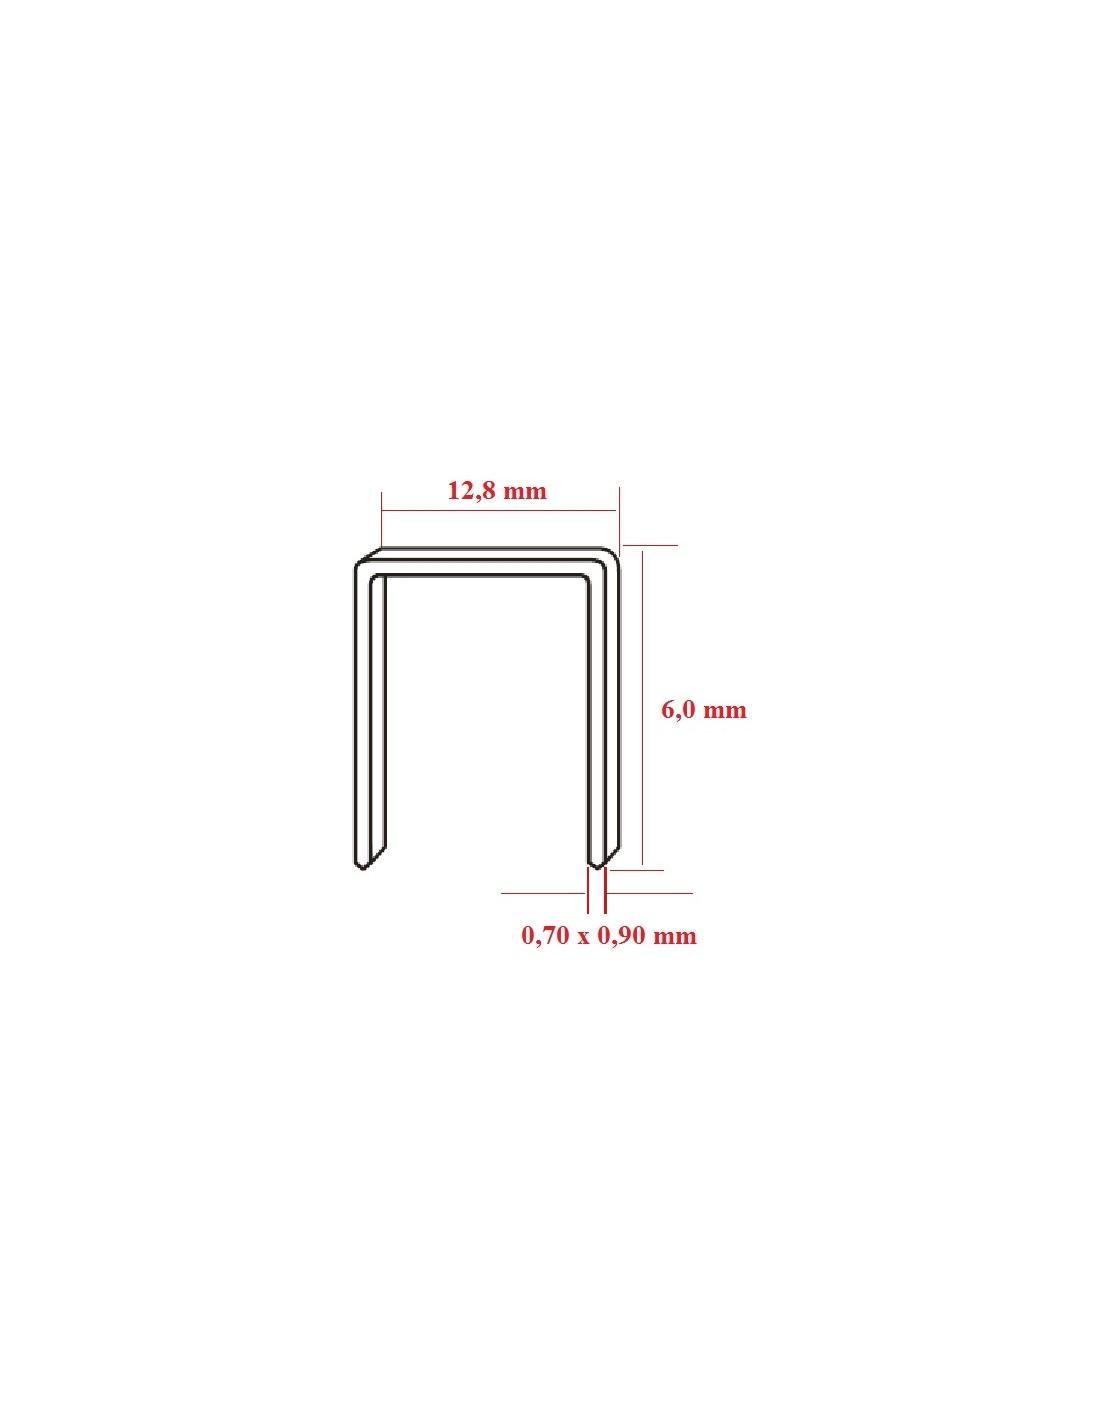 Capse tip U 80 cu lungimea de 6,0 mm - dimensiuni